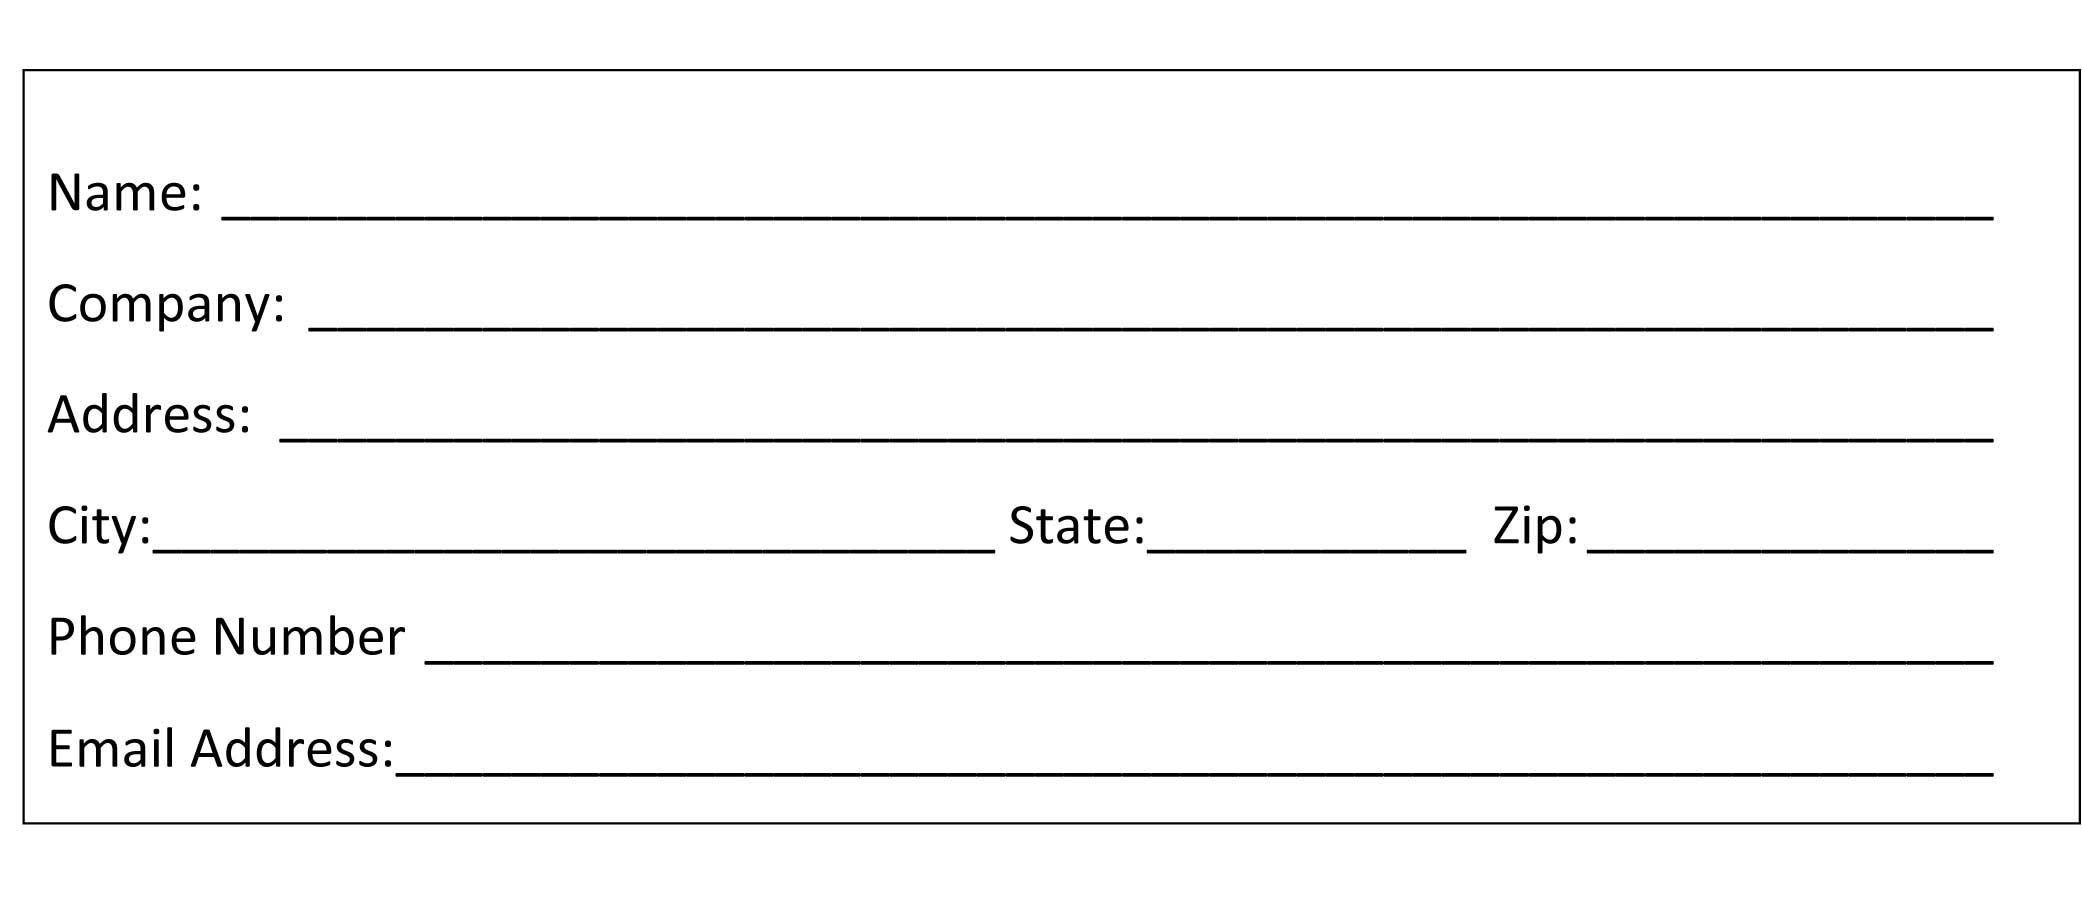 Doc725946 Blank Sponsorship Form Sponsorship Form Template – Blank Sponsorship Form